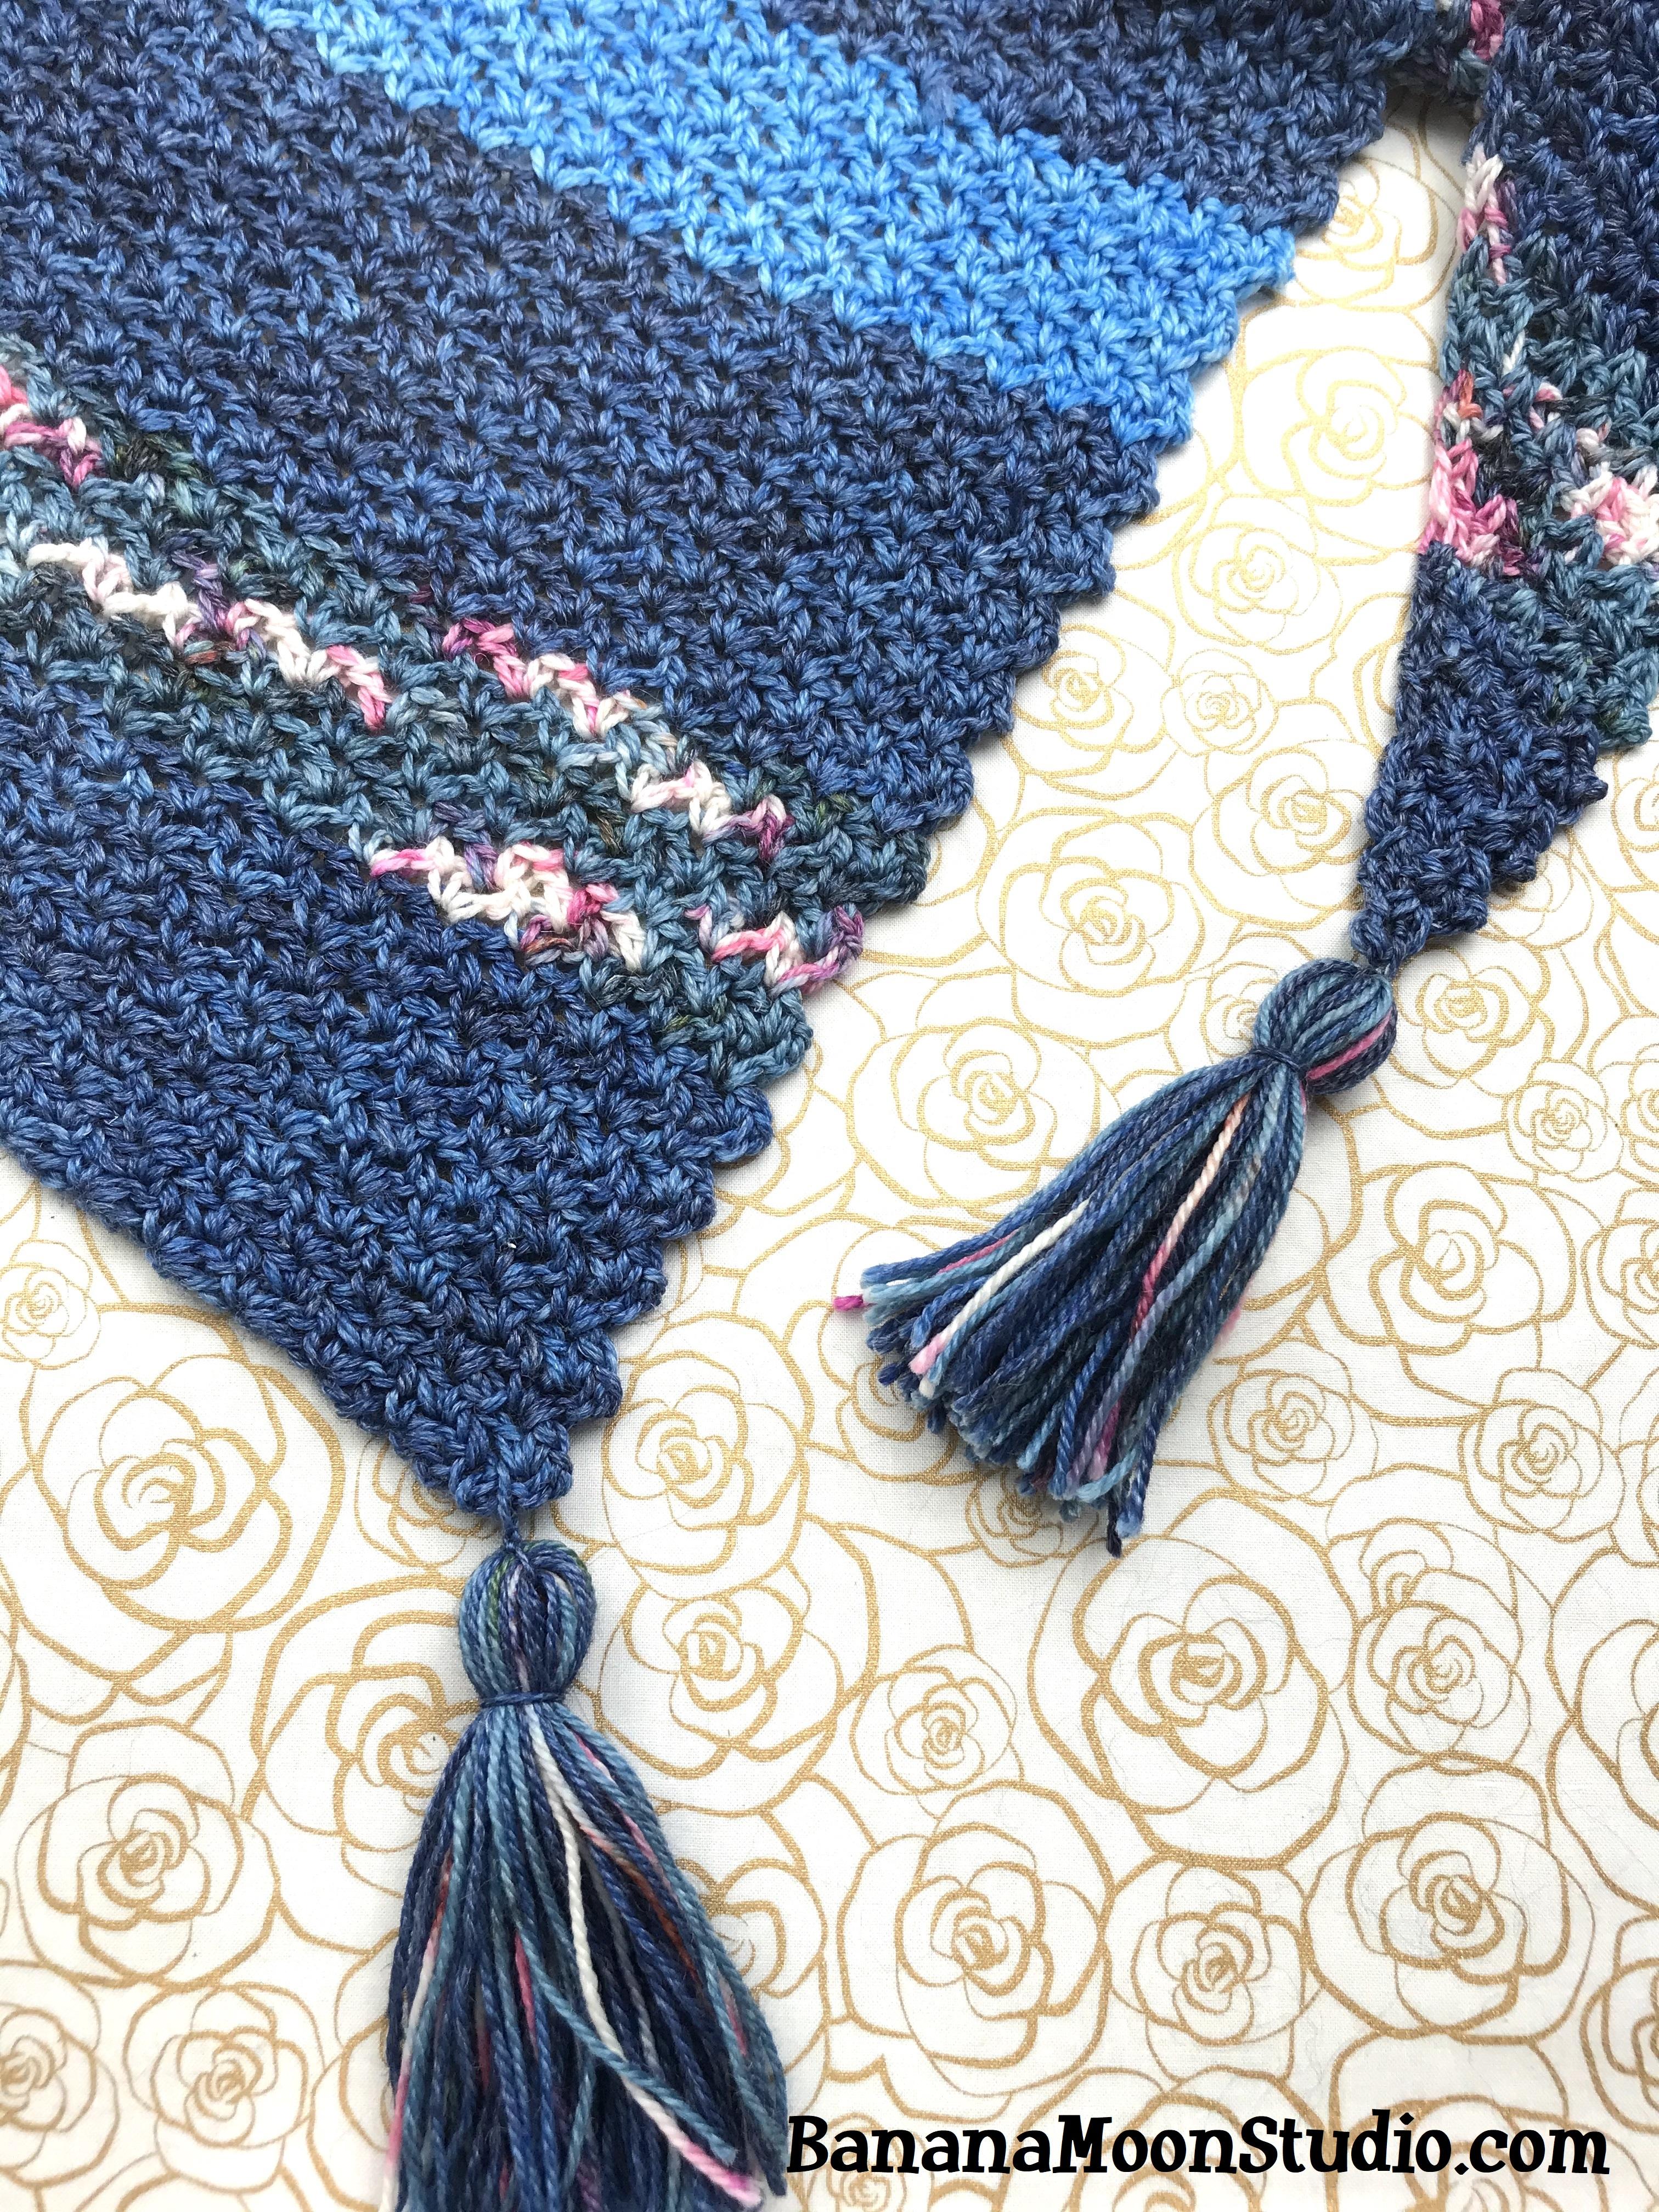 Free crochet pattern for a shawl from Banana Moon Studio